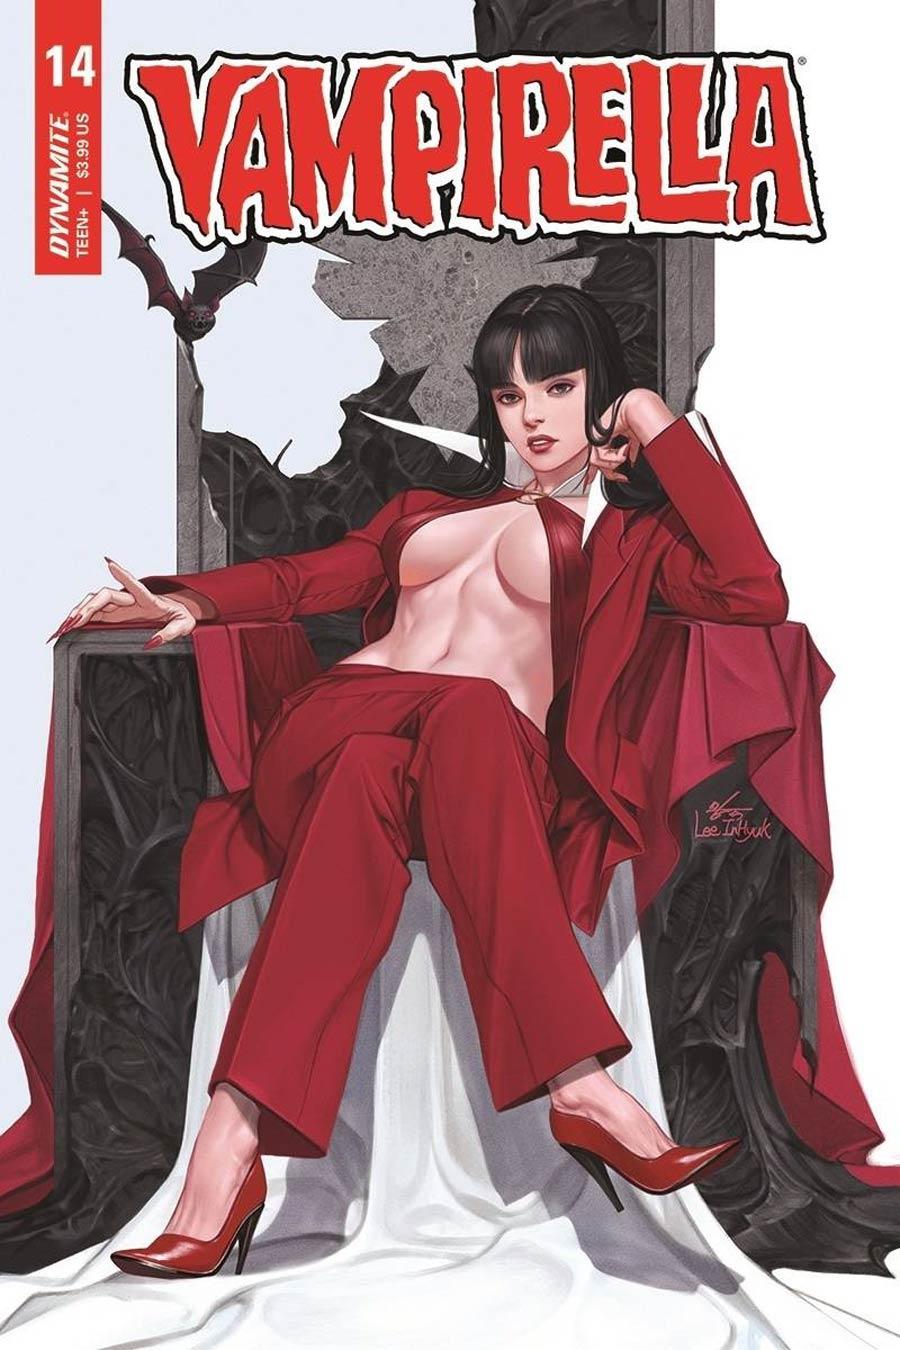 Vampirella Vol 8 #14 Cover B Variant Inhyuk Lee Cover